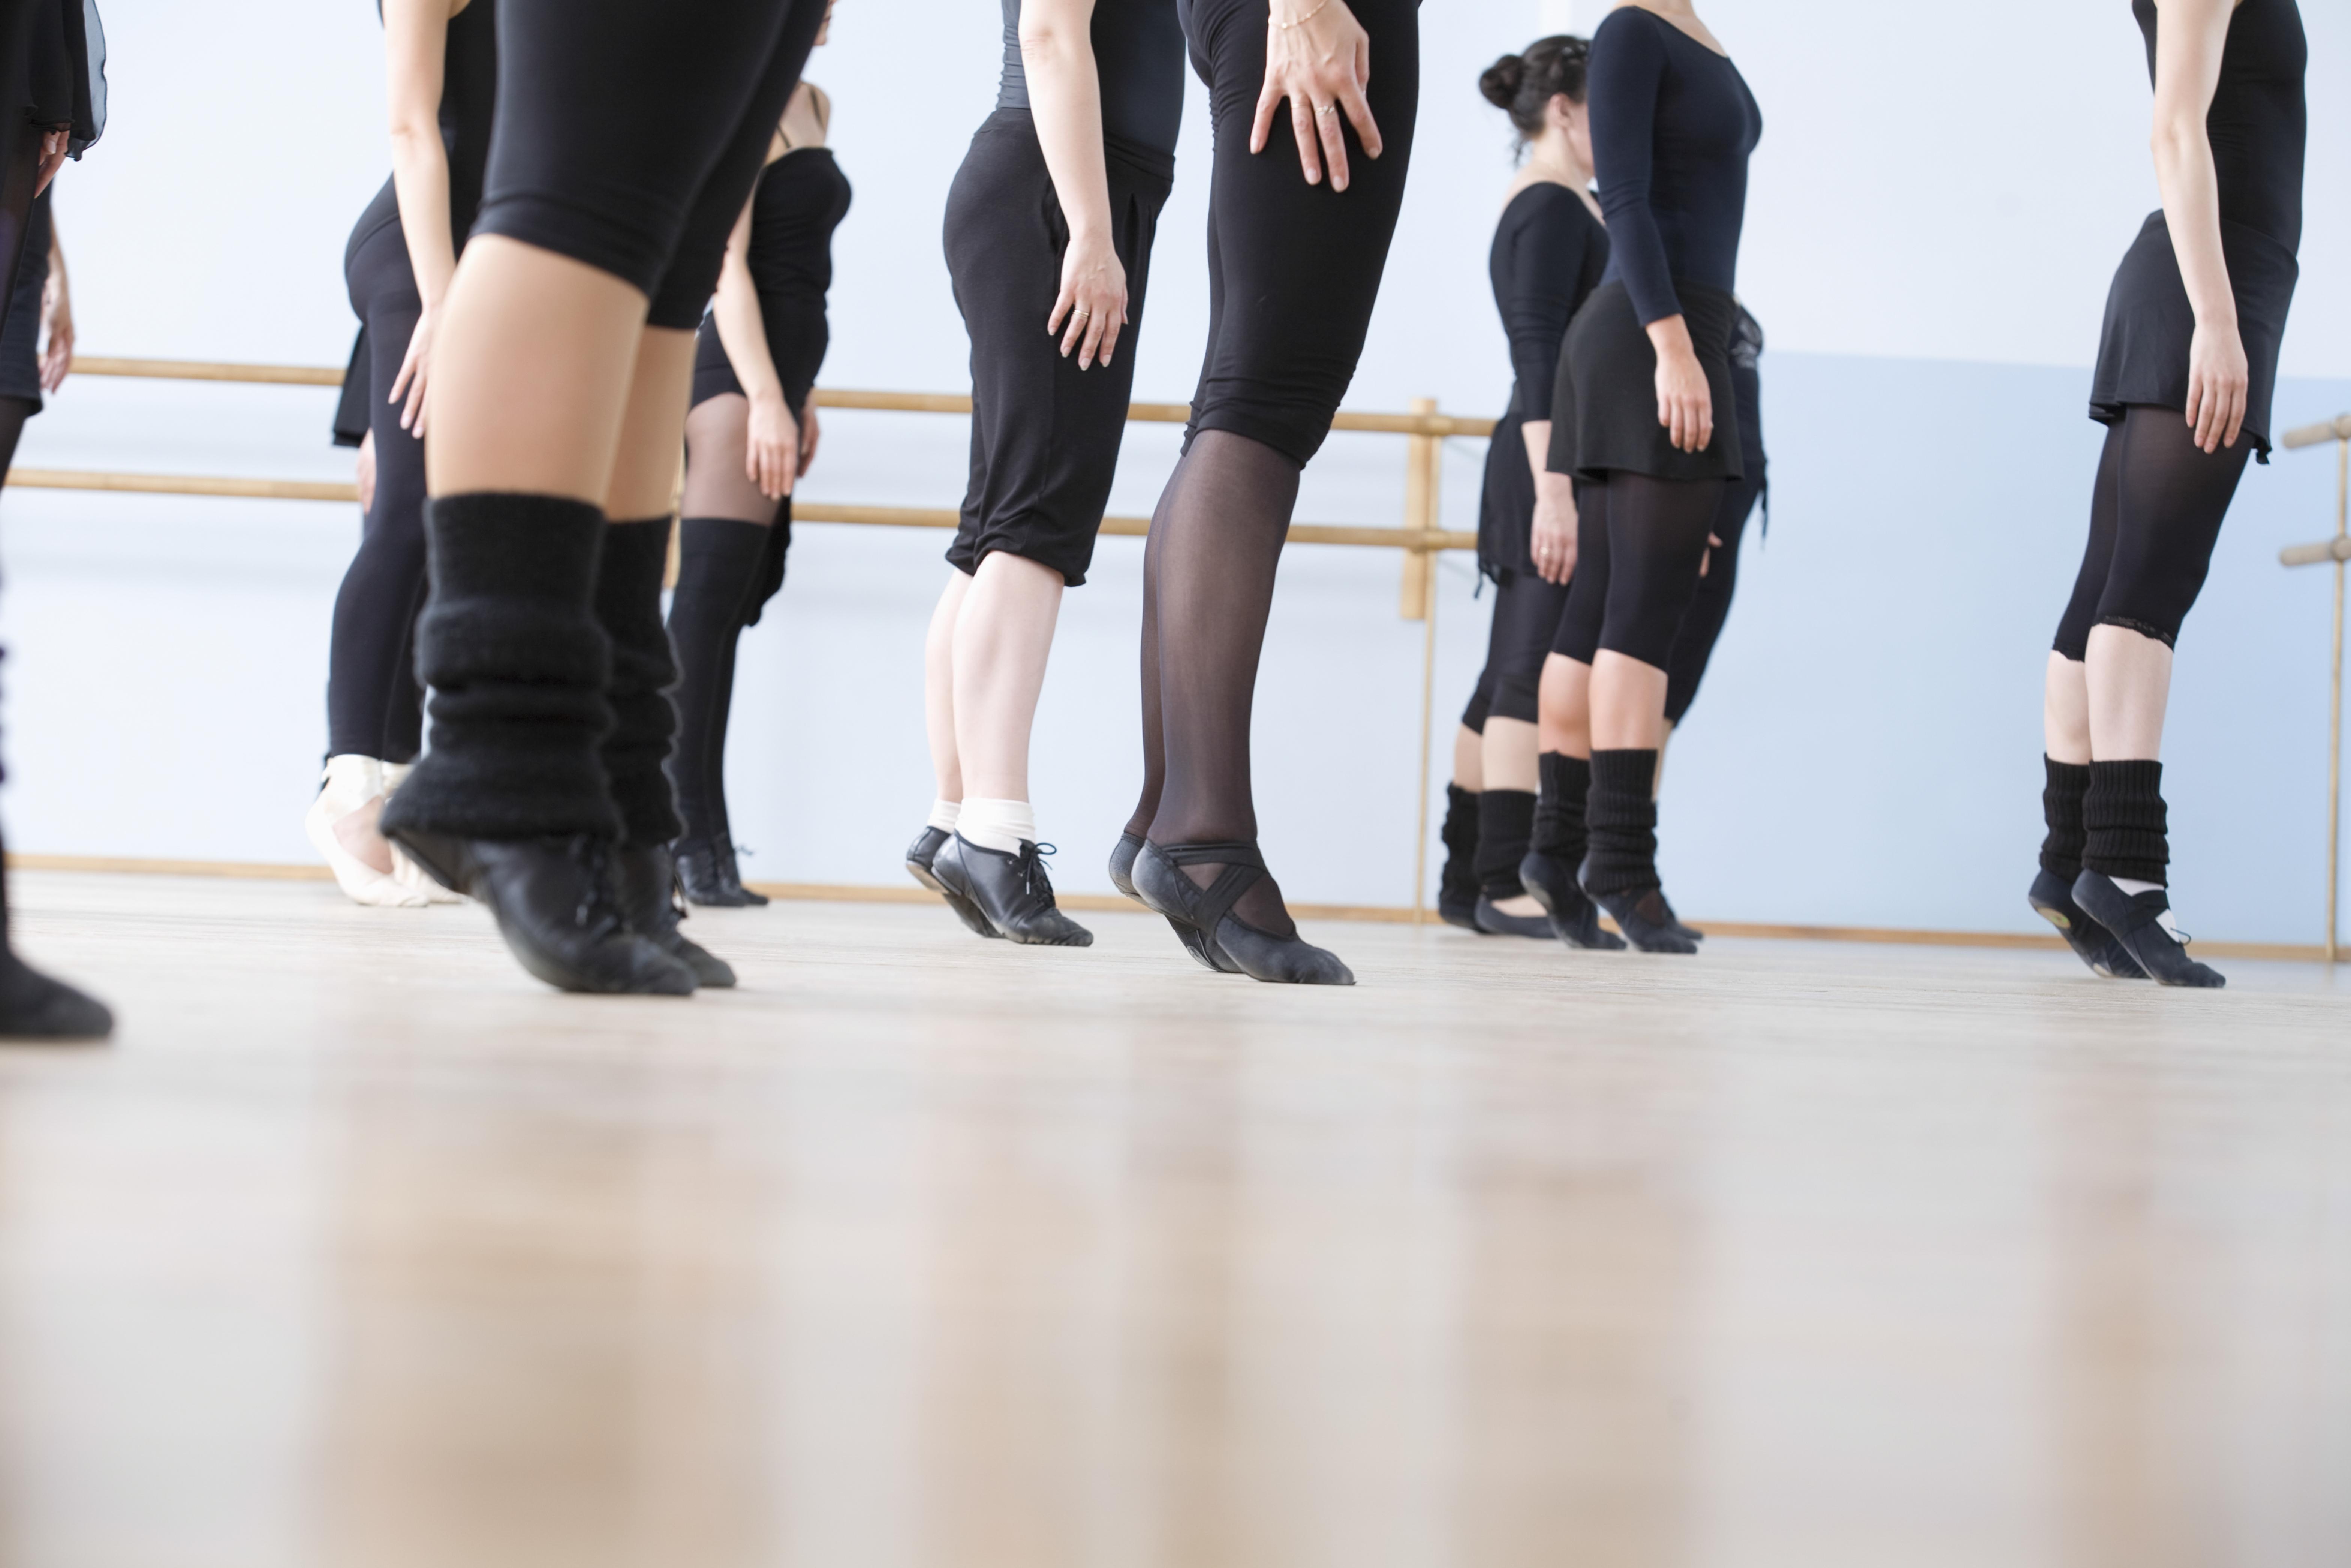 jazzdance foots